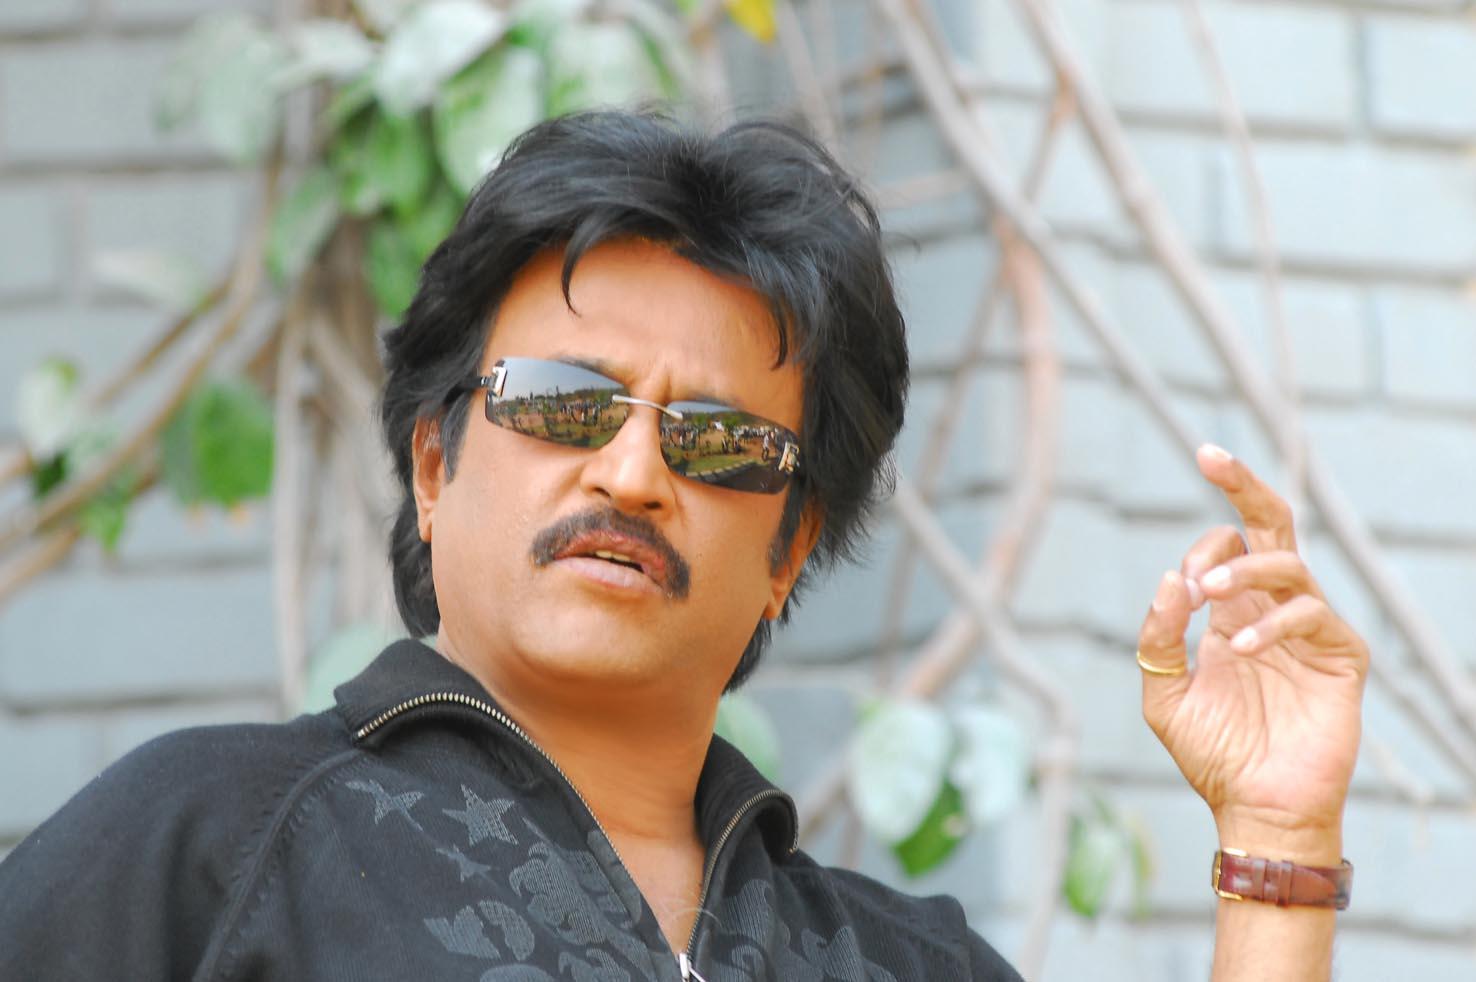 Rajinikanth Baaba Movie Songs Audio Mp3 Download